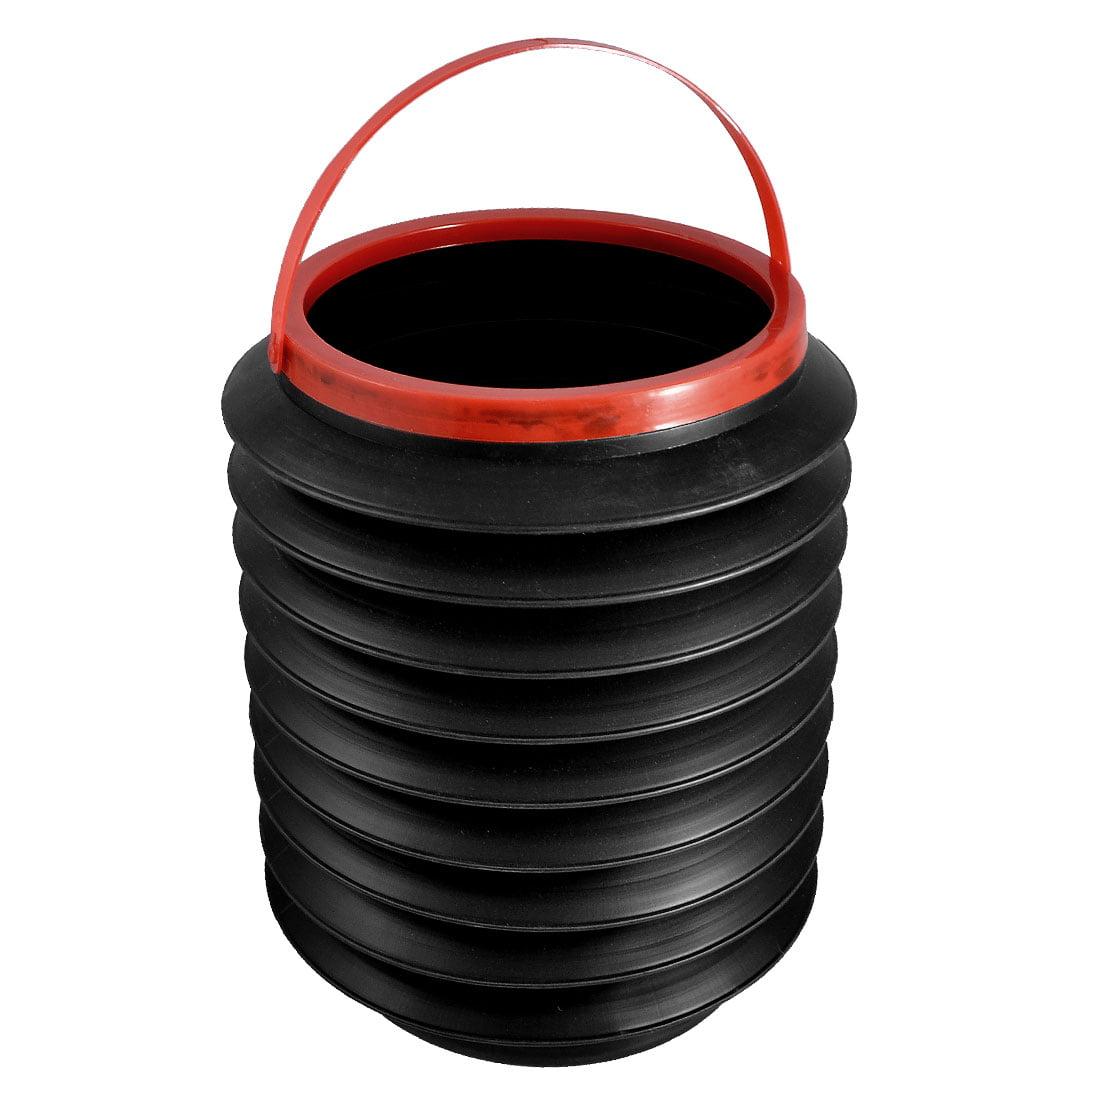 Car Auto Multifunctional Container Plastic  Trash Bin Storage Bucket